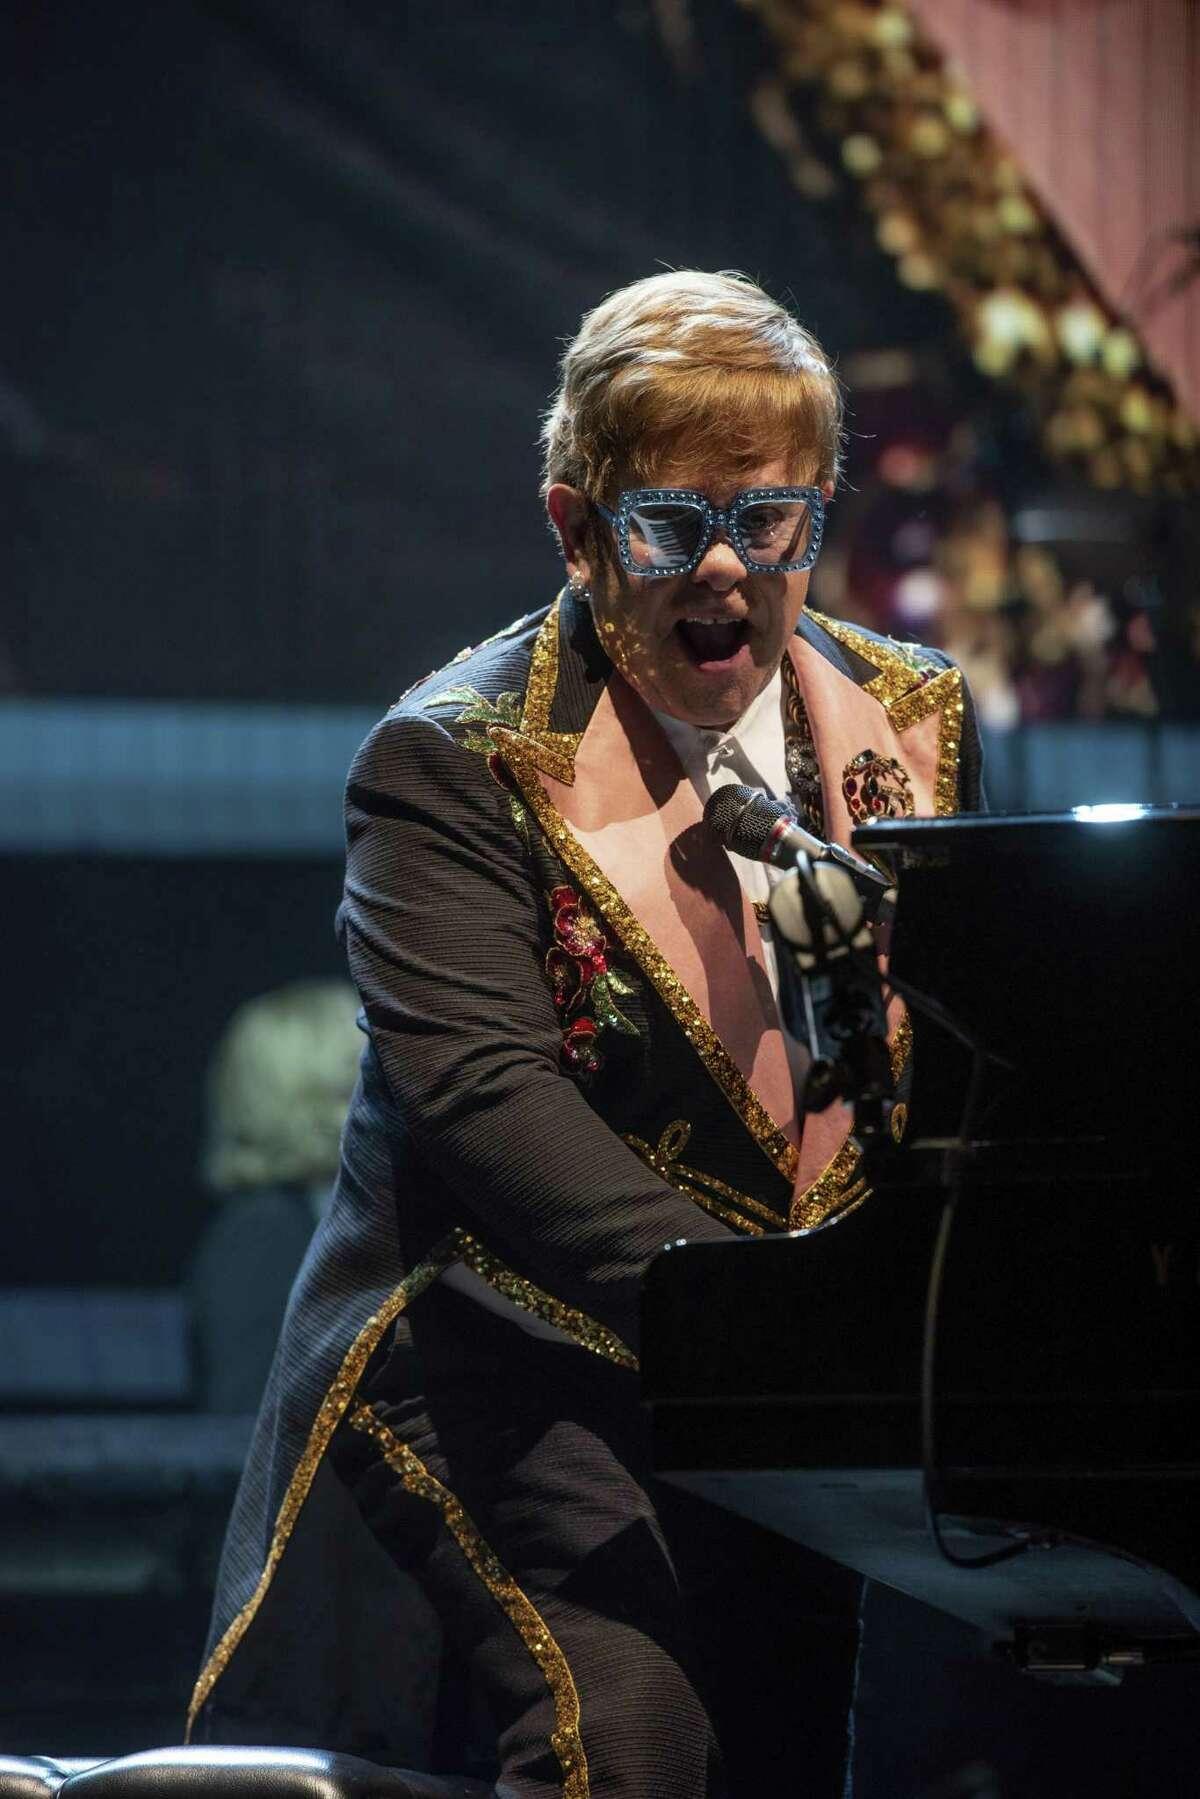 Elton John performs onstage at State Farm Arena on Saturday, Dec. 1, 2018, in Atlanta. (Photo by Paul R. Giunta/Invision/AP)